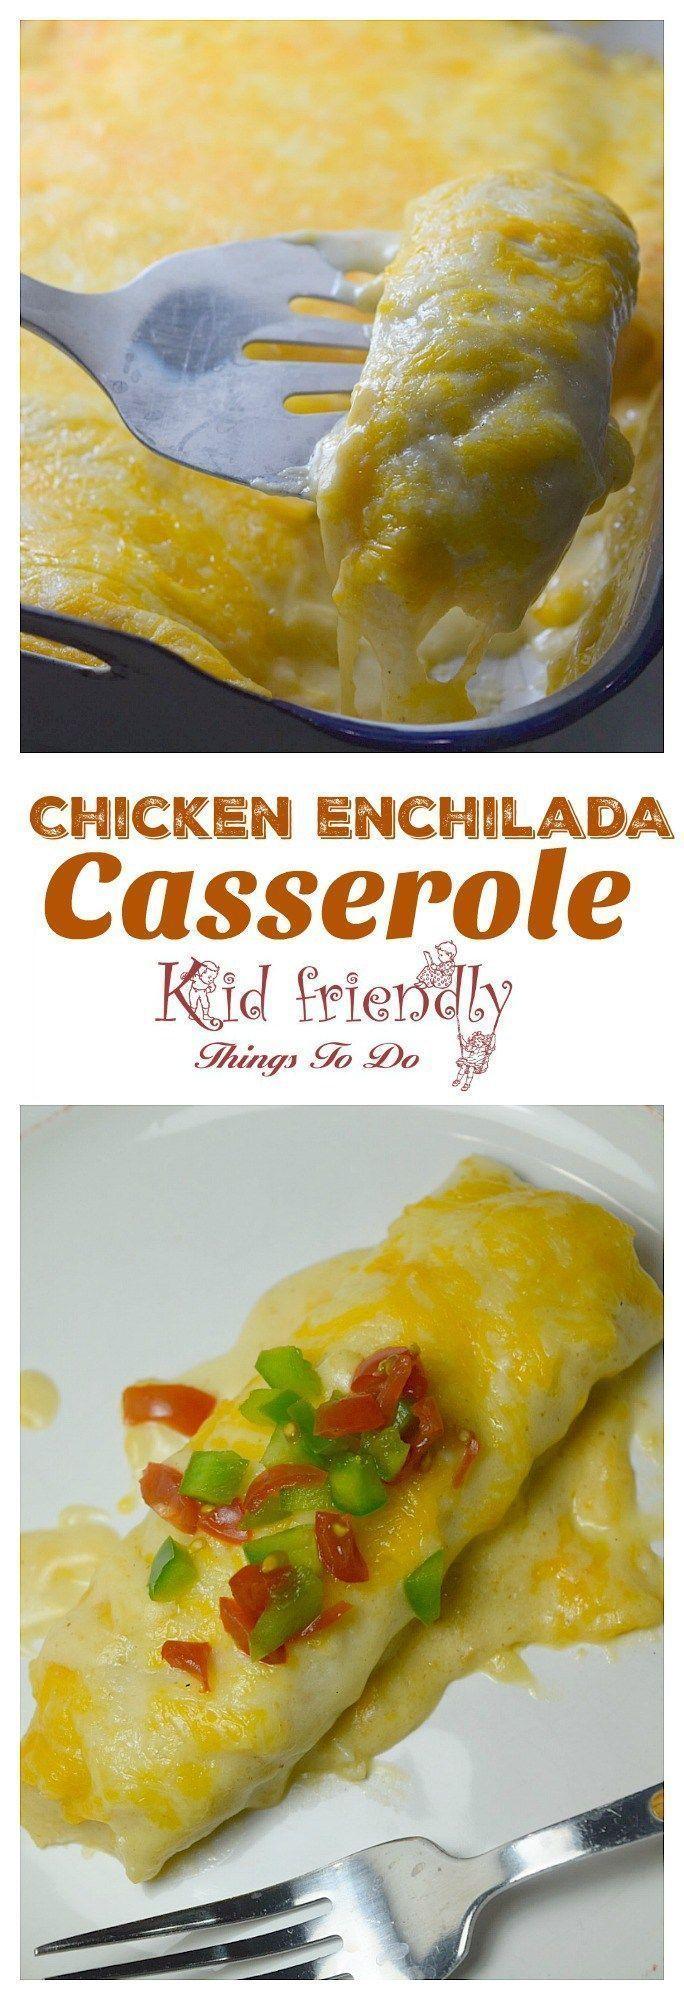 Chicken Enchilada Casserole with Sour Cream sauce - http://www.kidfriendlythingstodo.com